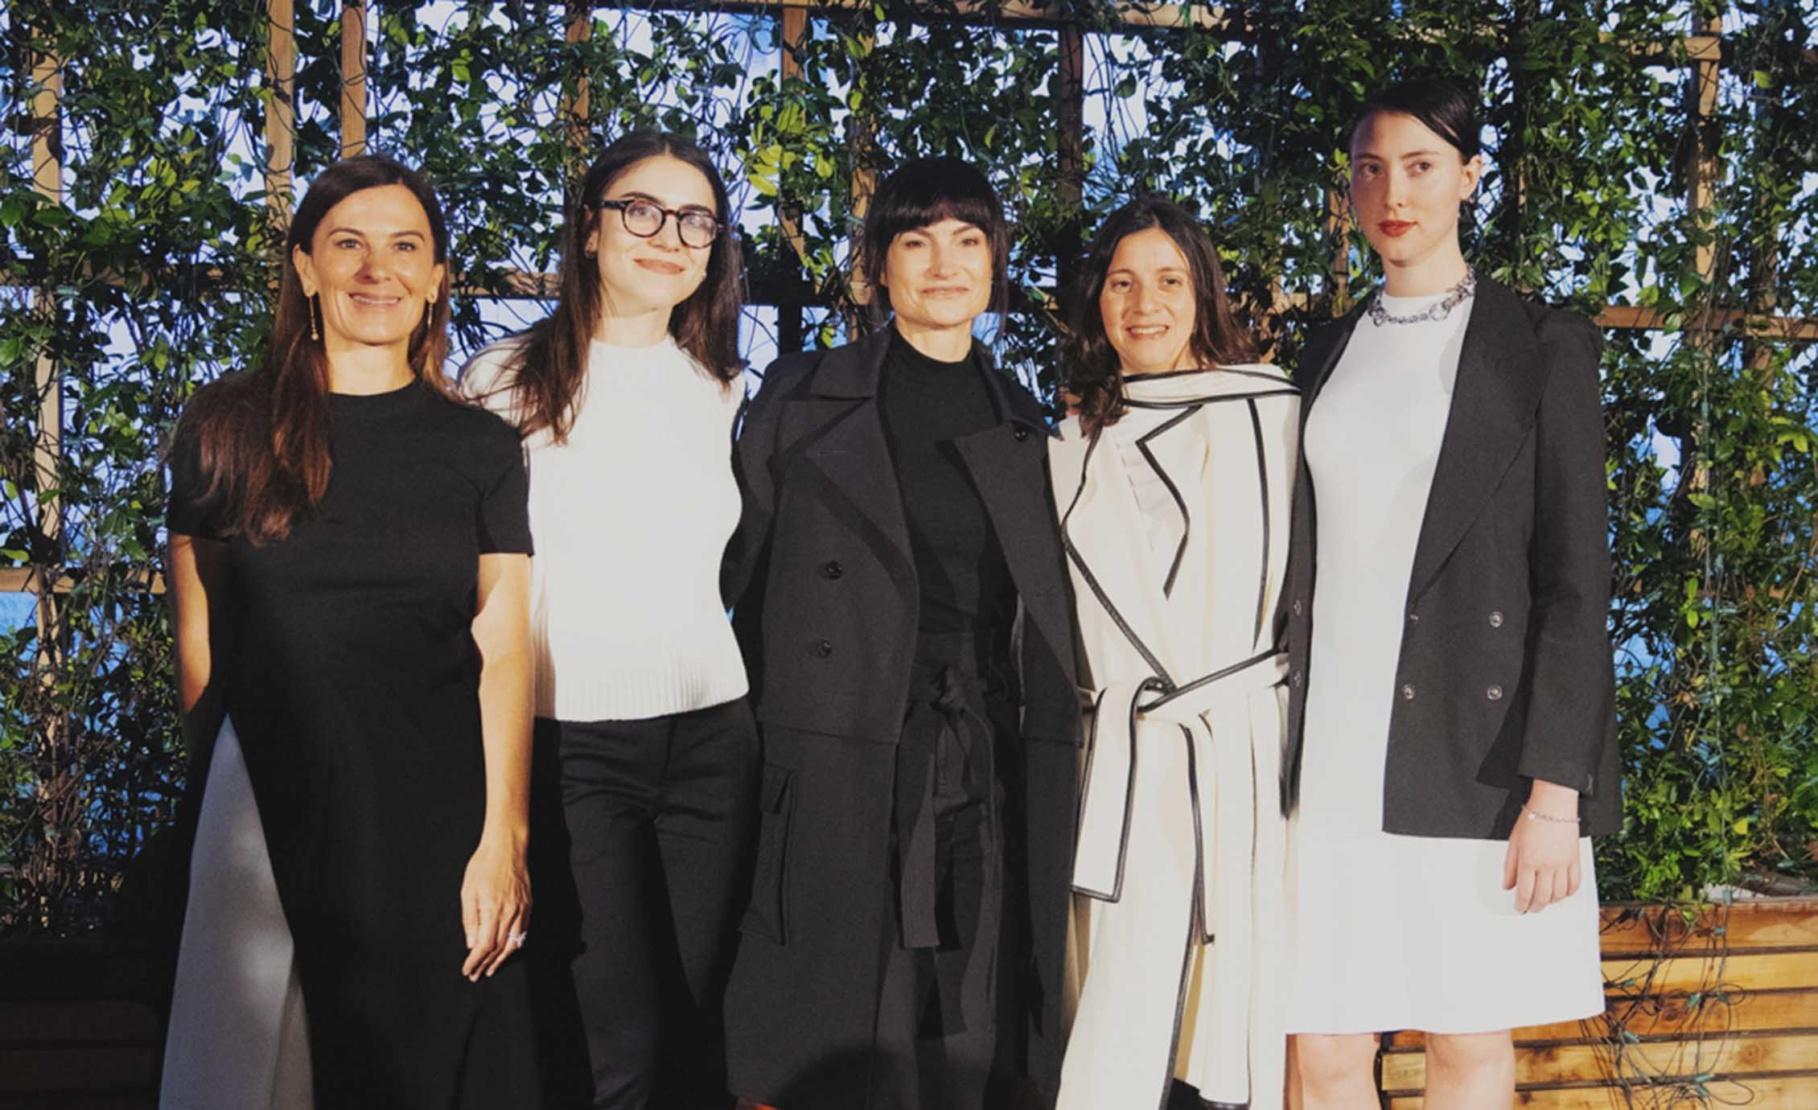 Sarah Harrelson, Alexandra Pechman, Rosetta Getty, Analia Saban and Hayden Dunham